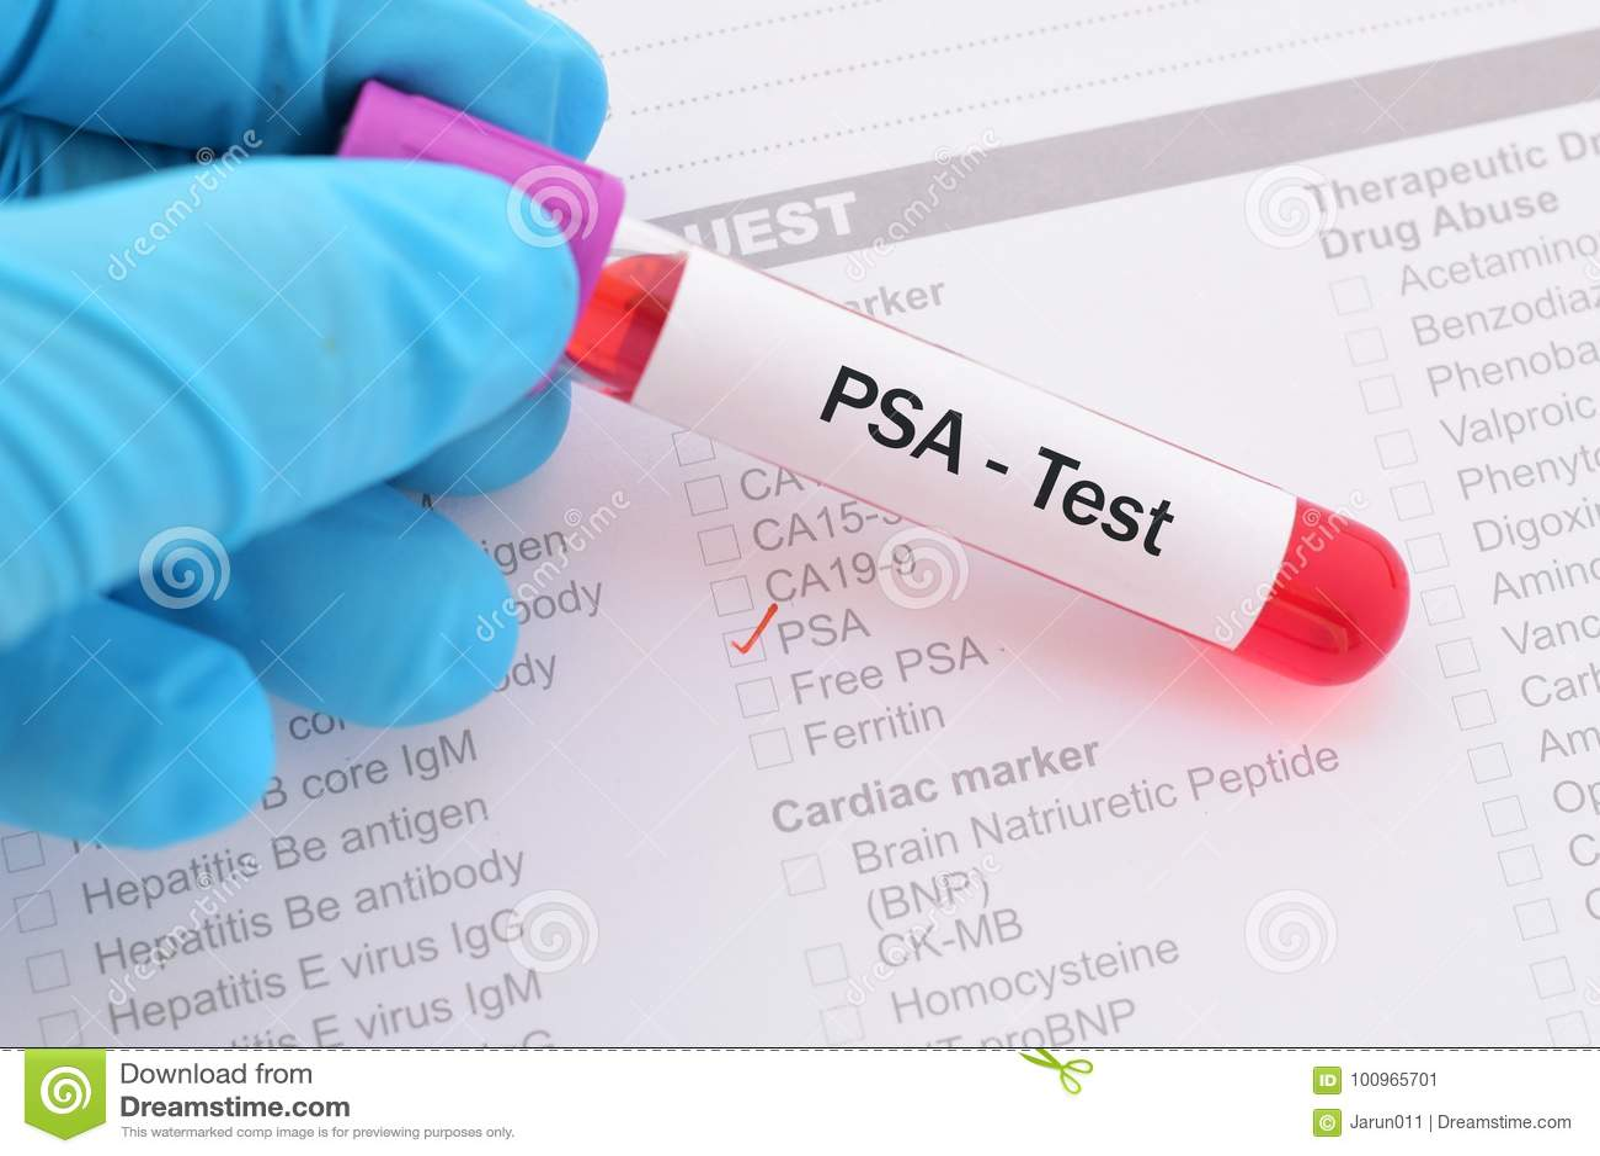 estudio de sangre de prostata